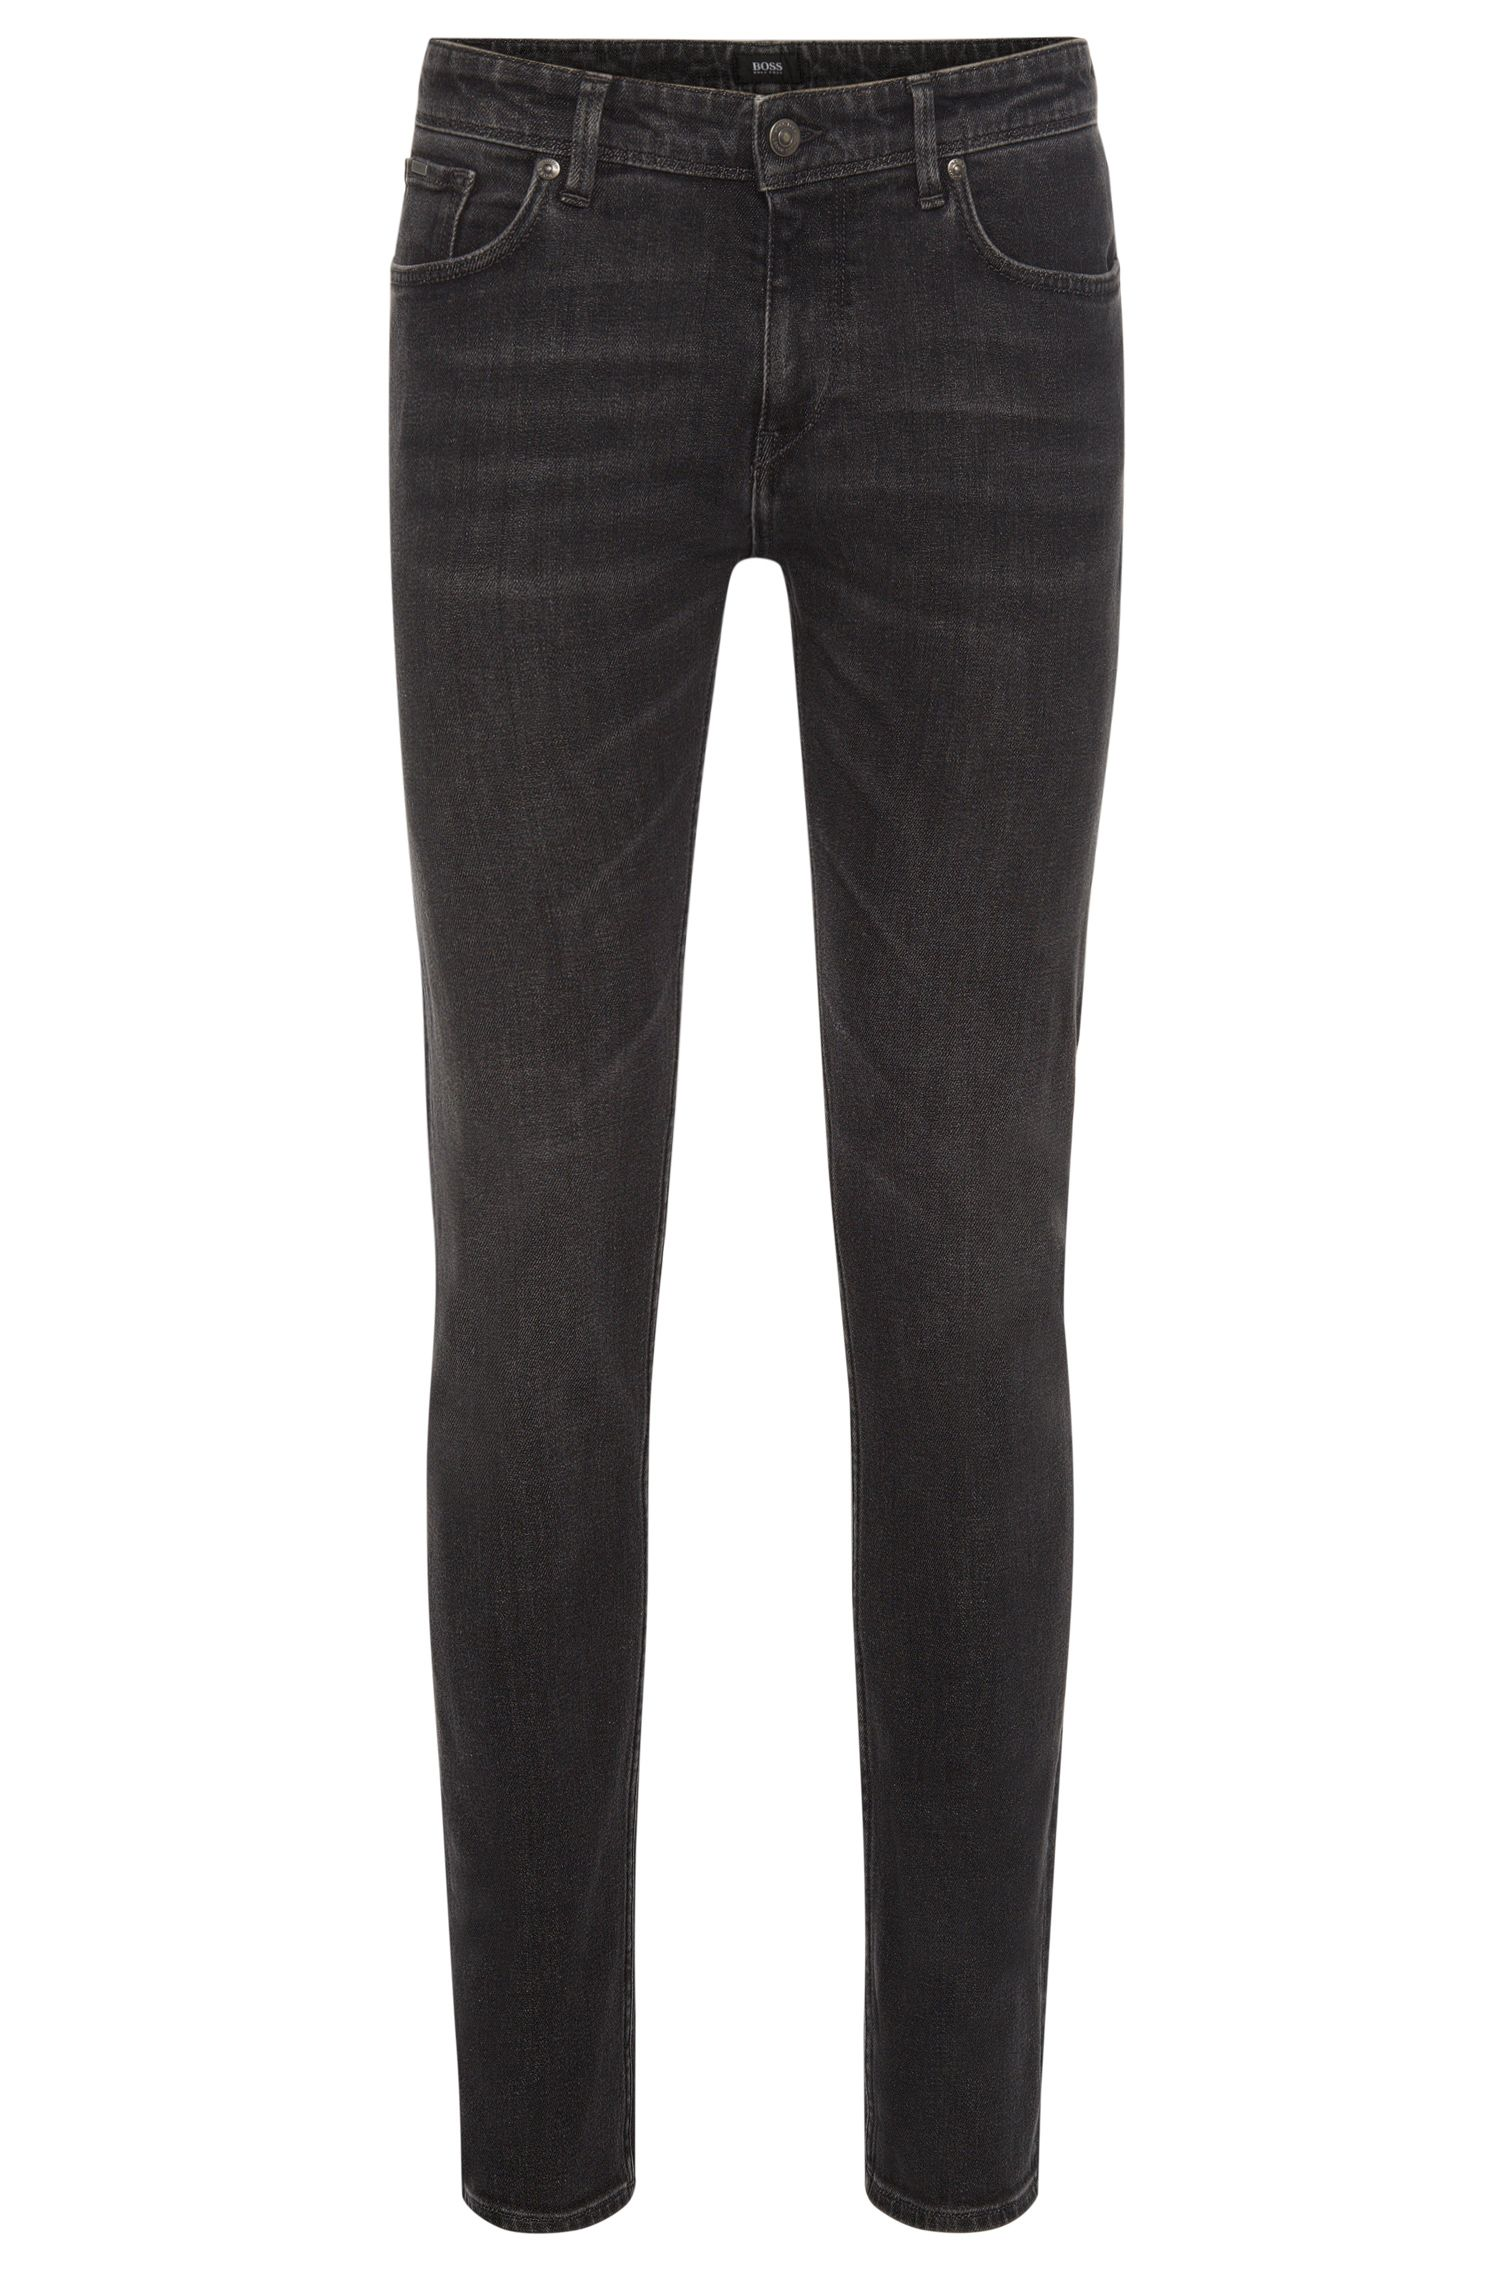 'Charleston' | Extra Slim Fit, 11.25 oz Stretch Cotton Jeans